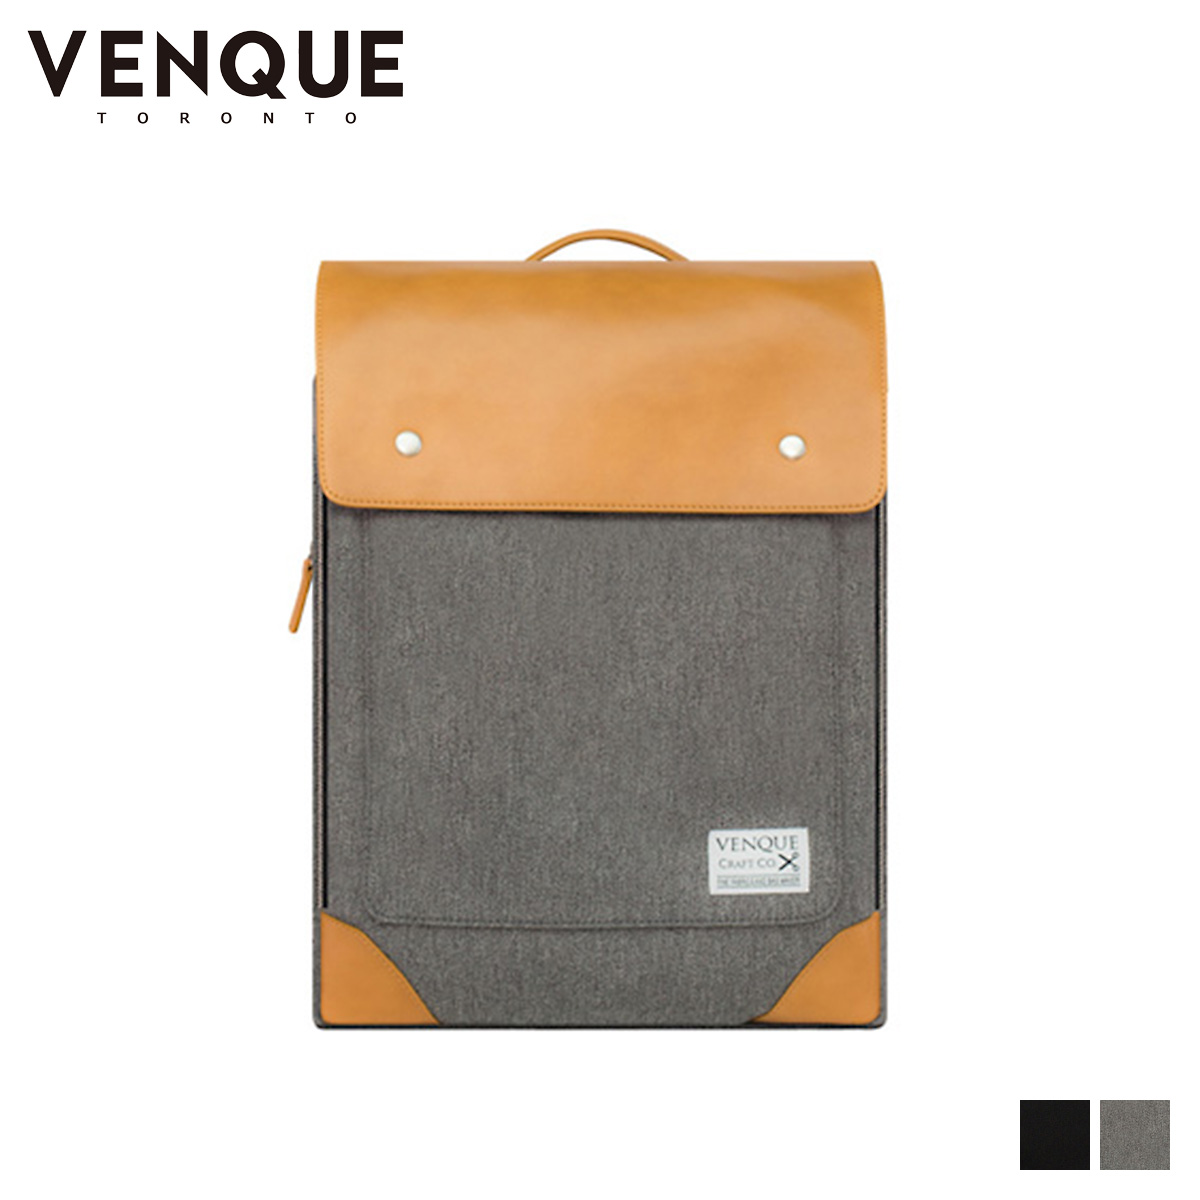 VENQUE FLATSQUARE ヴェンク リュック バッグ バックパック メンズ レディース 24L ブラック グレー 黒 [7/22 追加入荷]